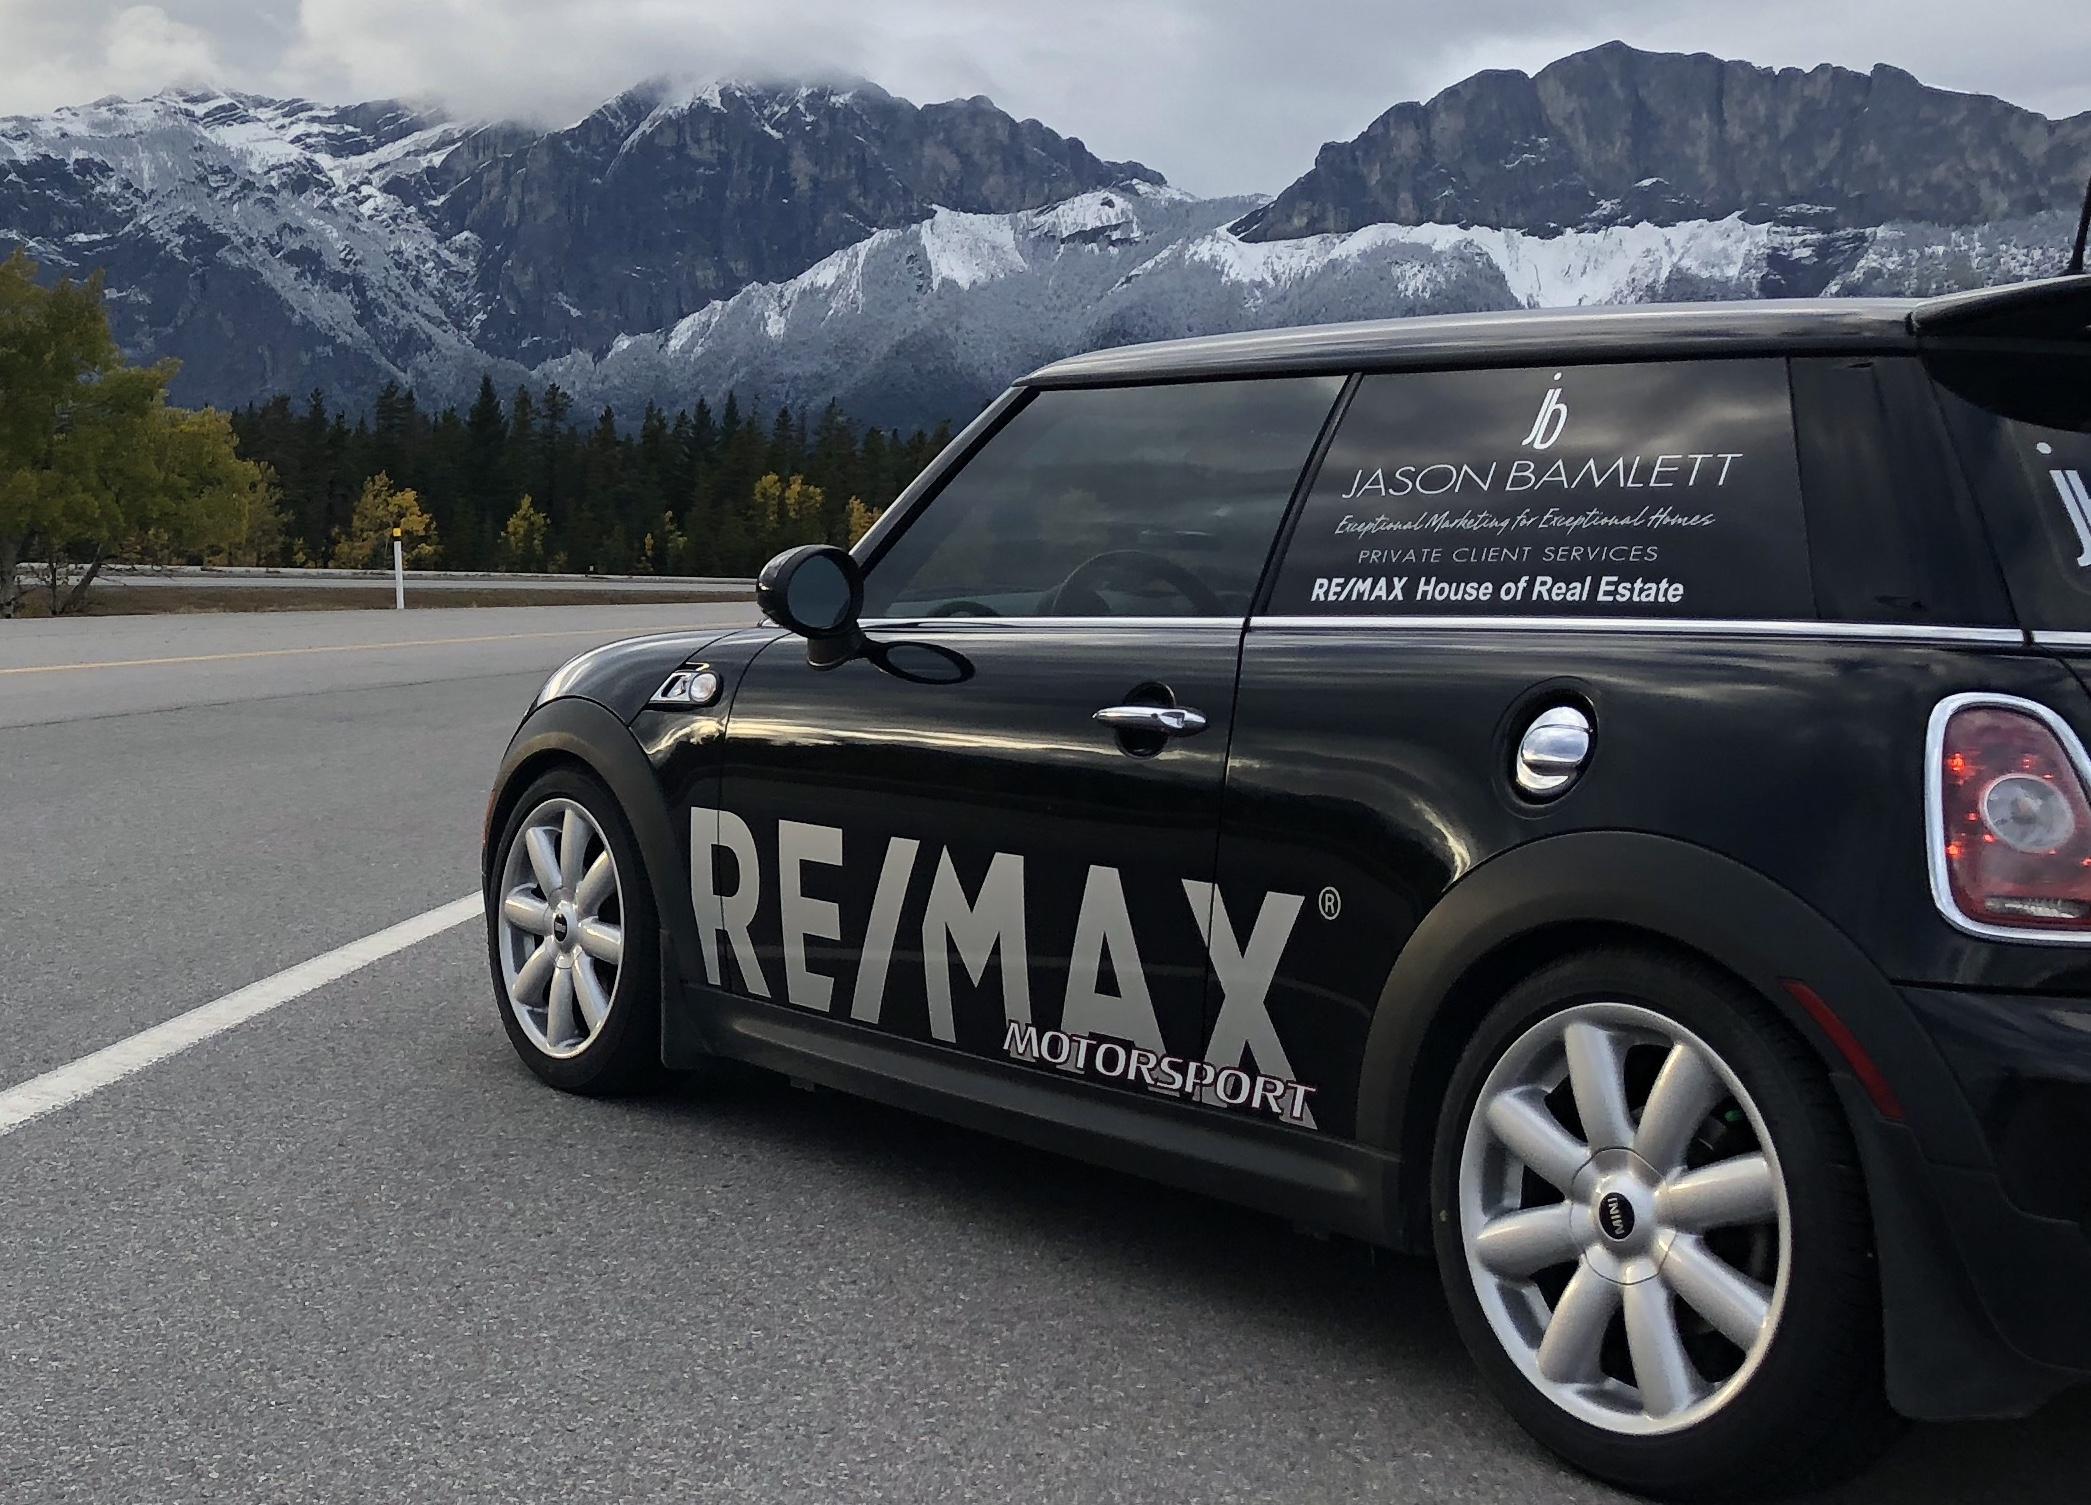 Remax Motorsports